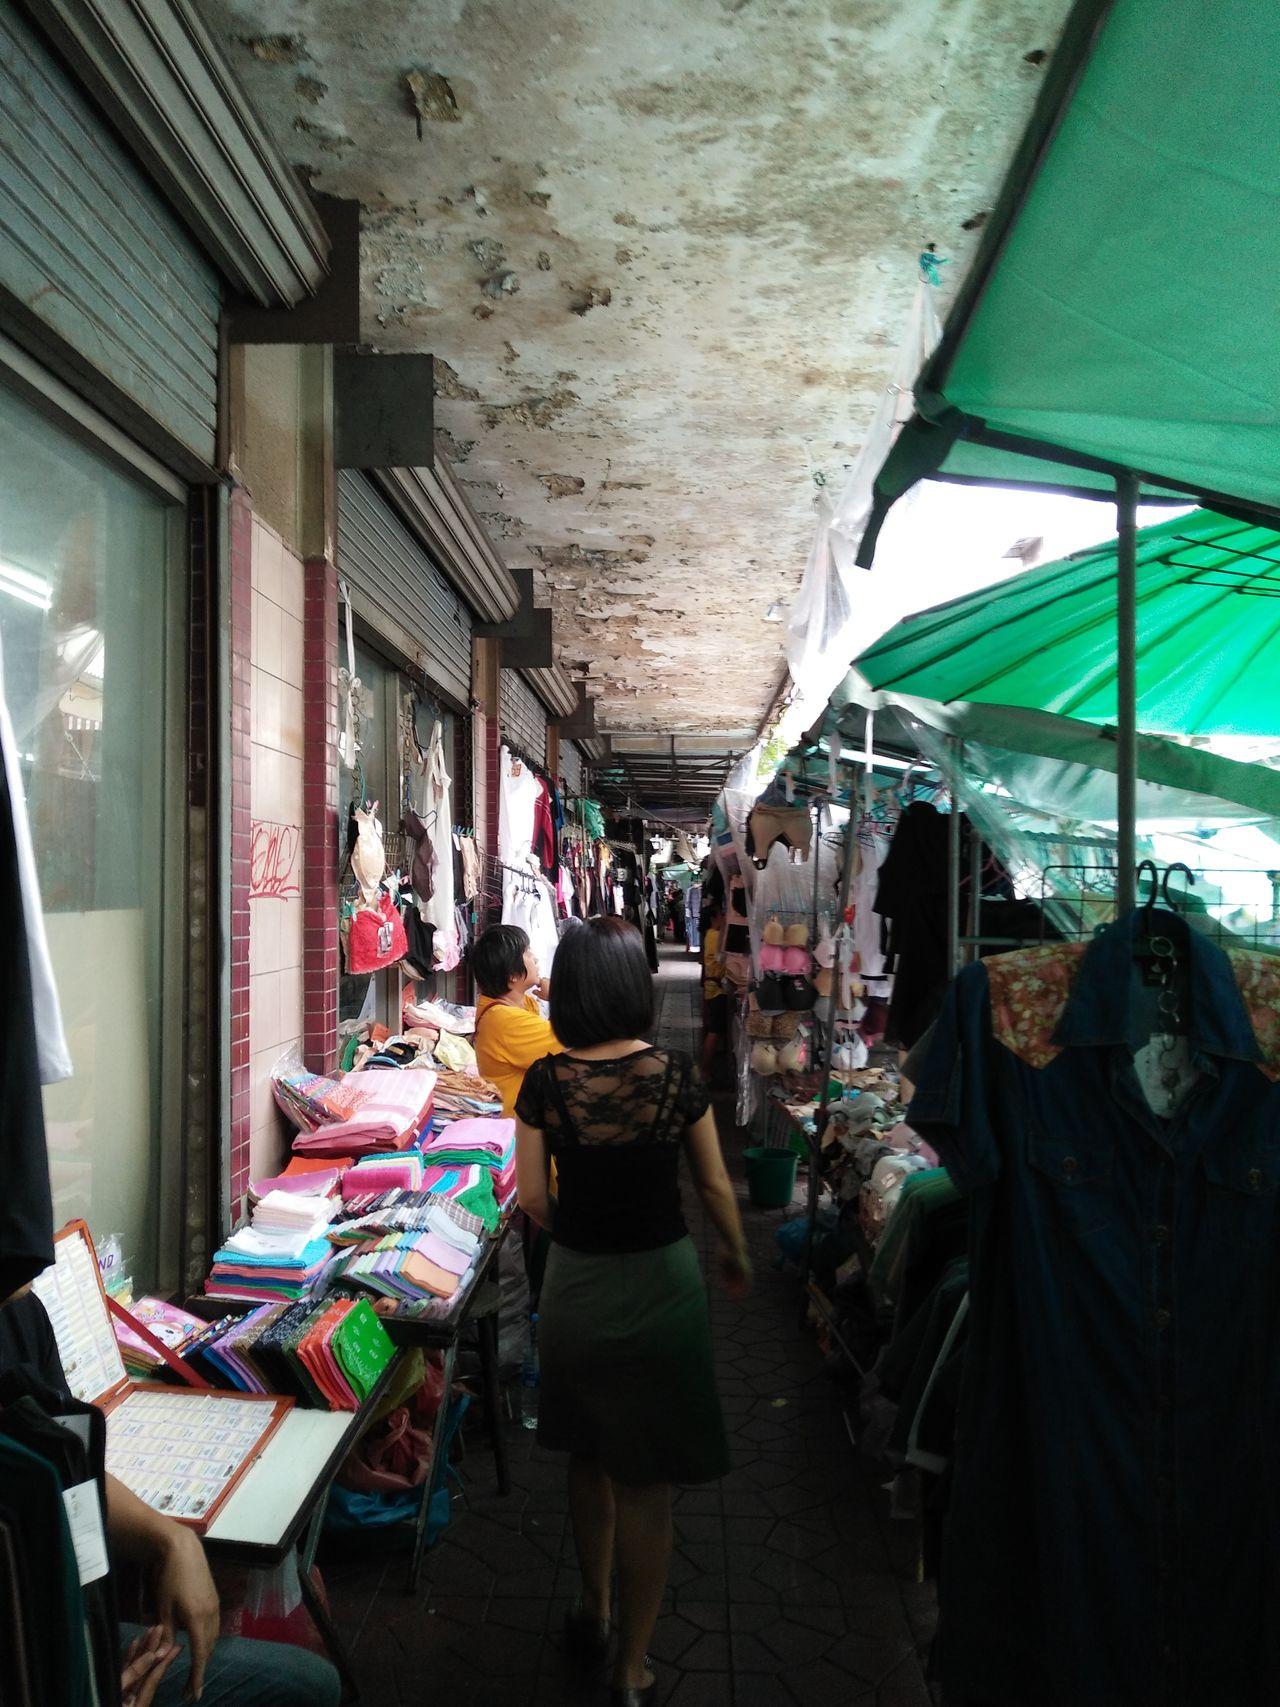 Market Retail  Streetphotography Street Market Oppo Smartphone Street Vender Day People Street Life Street Life In Bangkok Bangkok Bangkok Thailand.